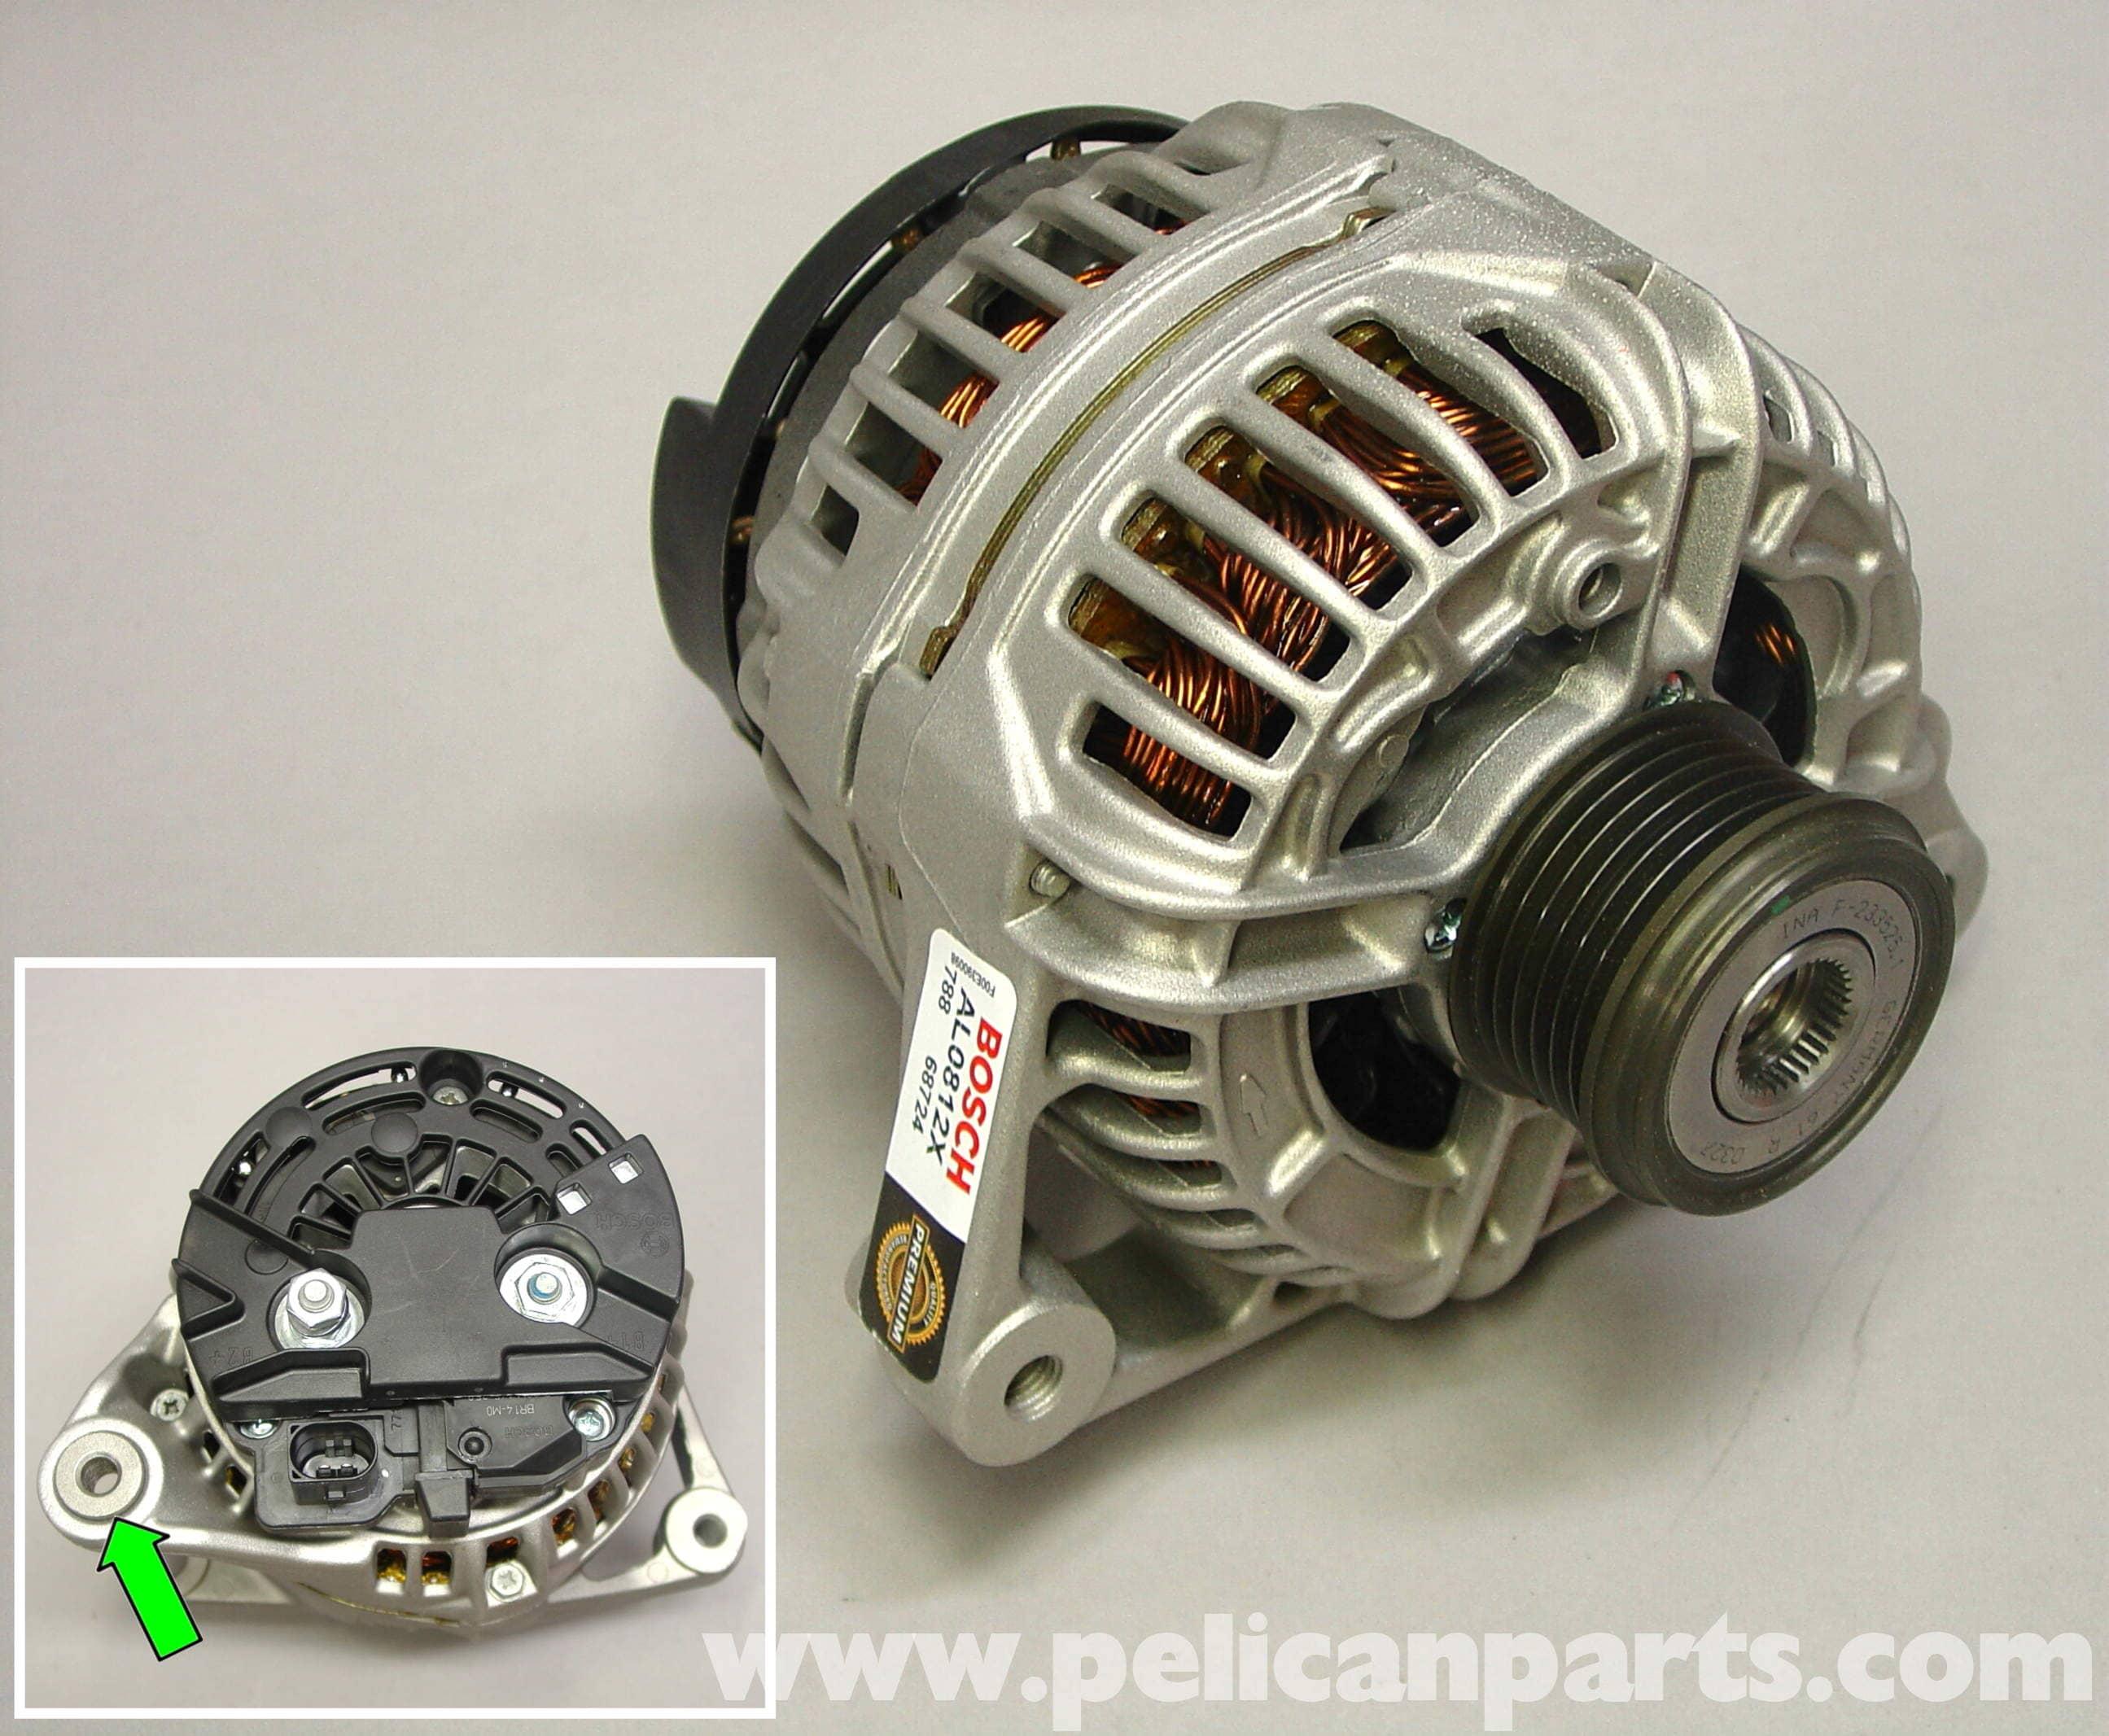 pic01 porsche 911 carrera alternator replacement 996 (1998 2005) 997  at fashall.co